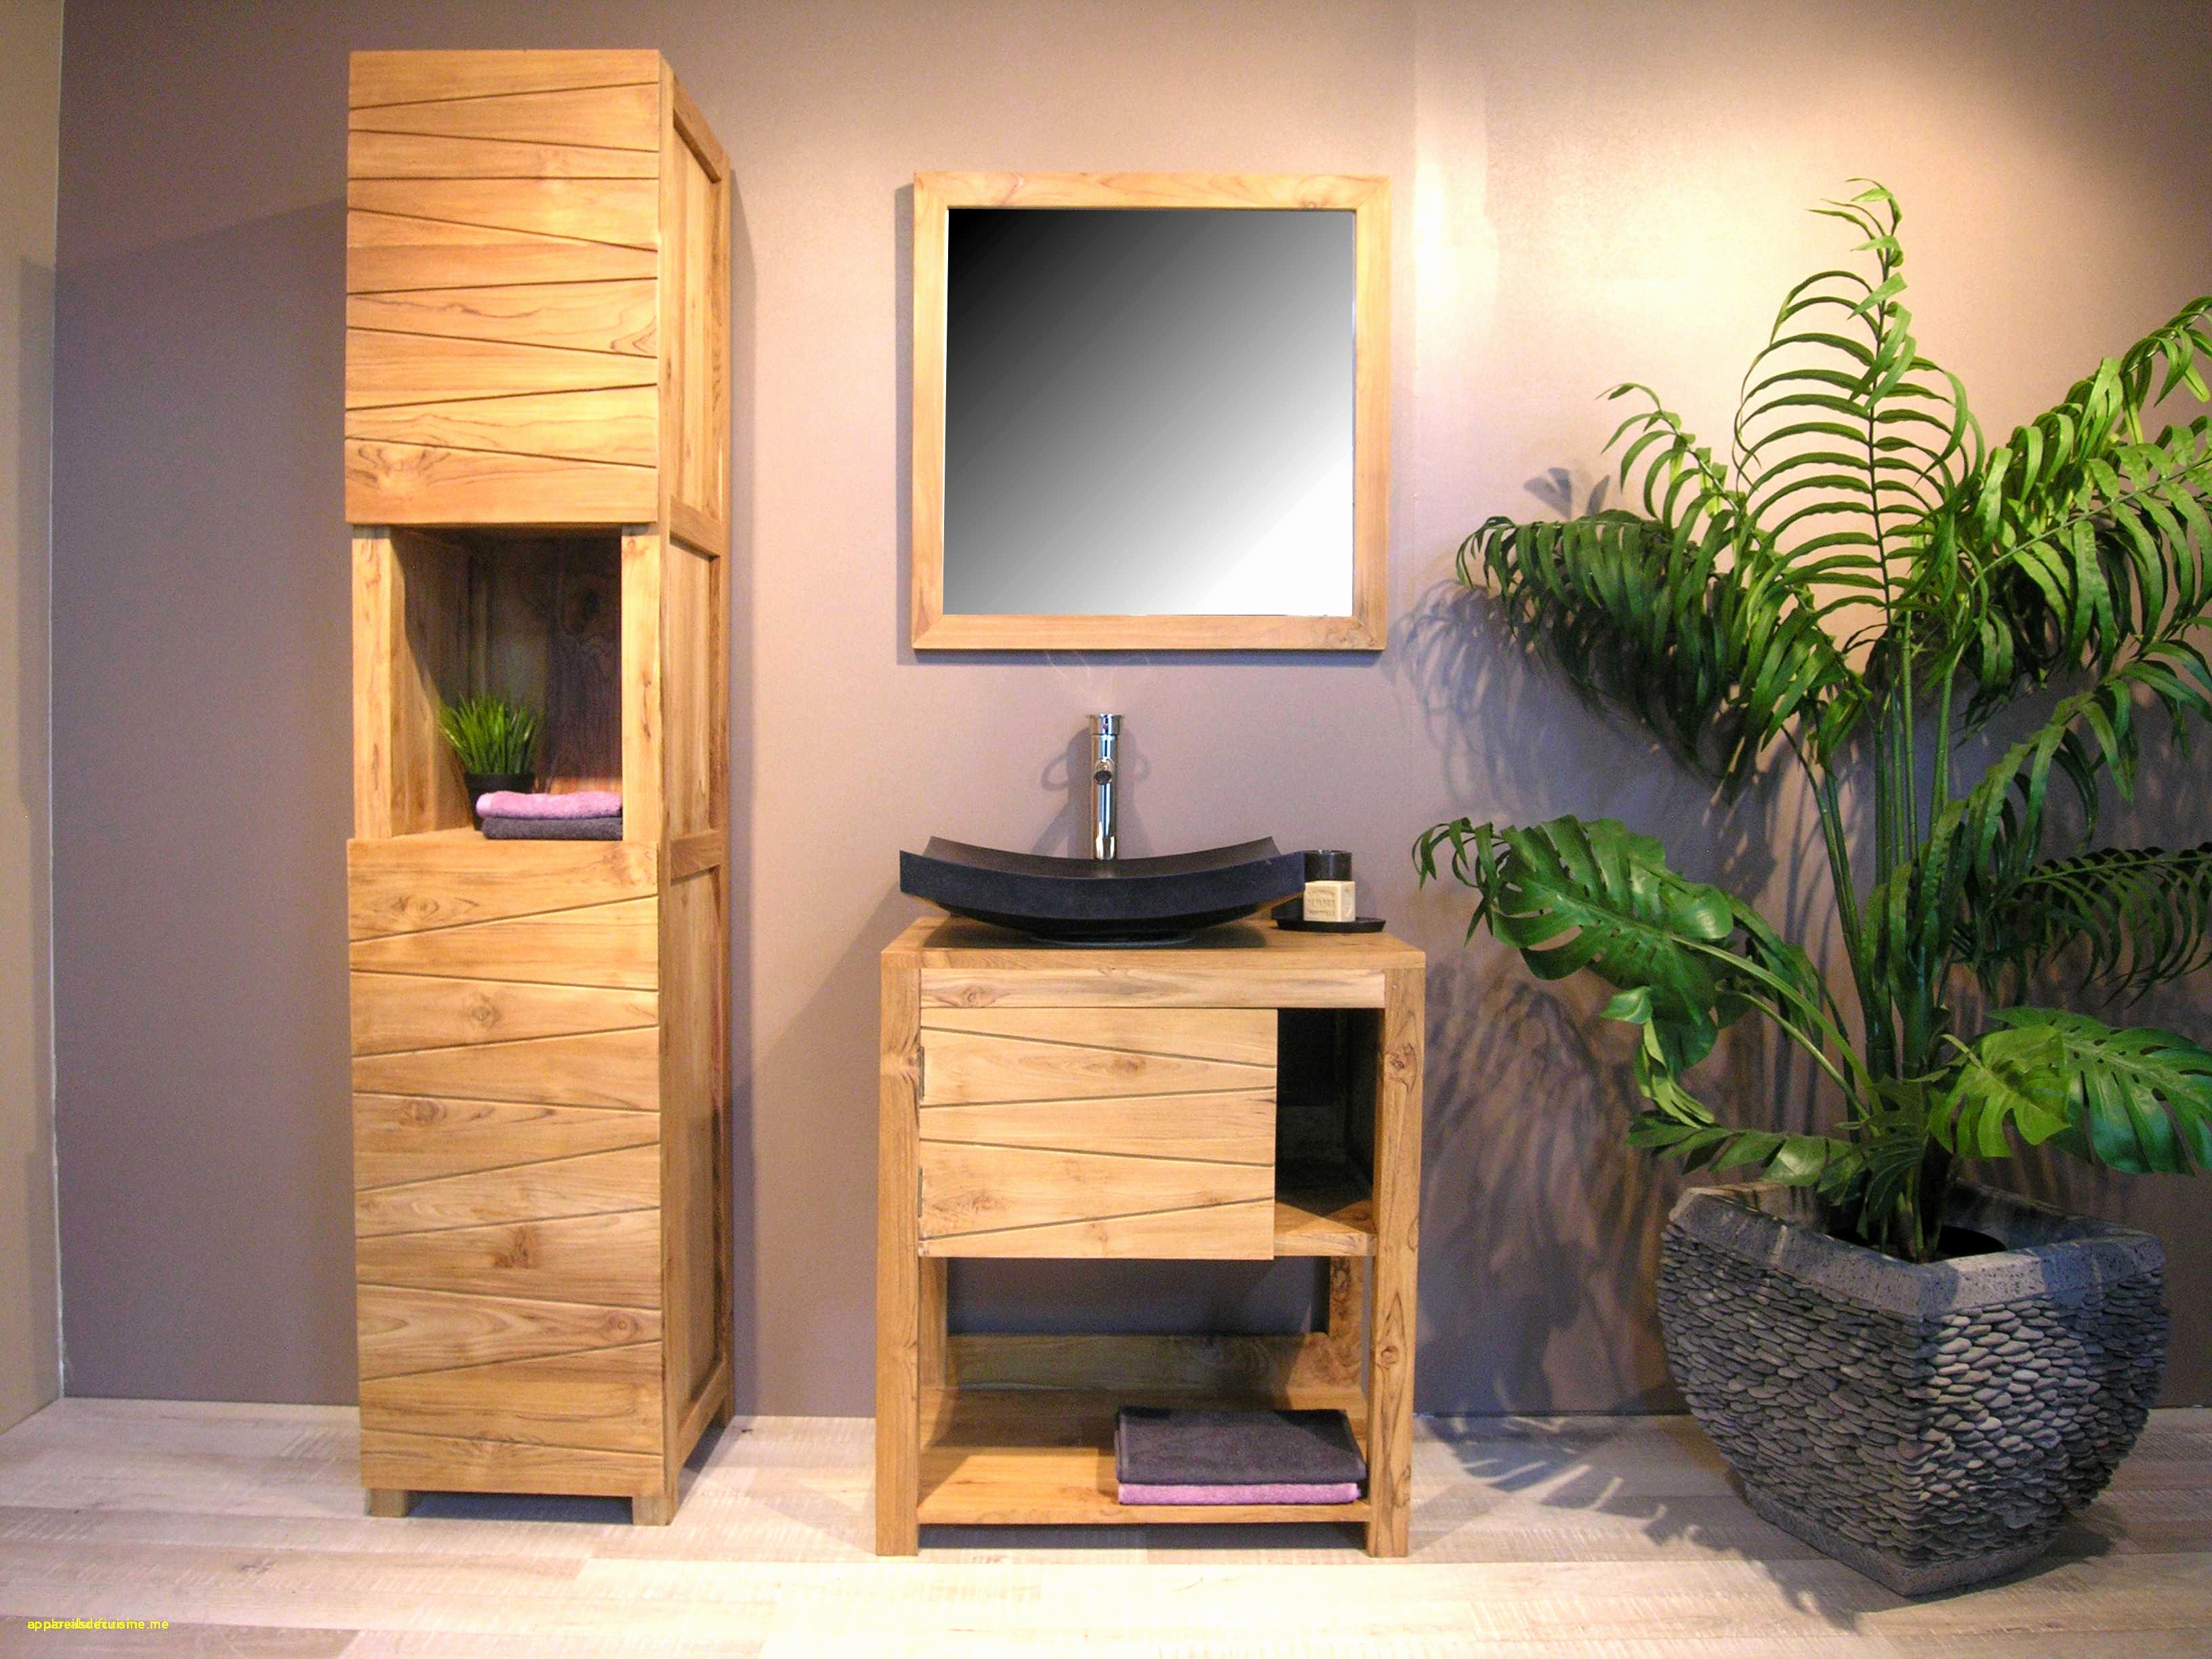 Ikea Meuble toilette Nouveau Photos Takahirohayakawa